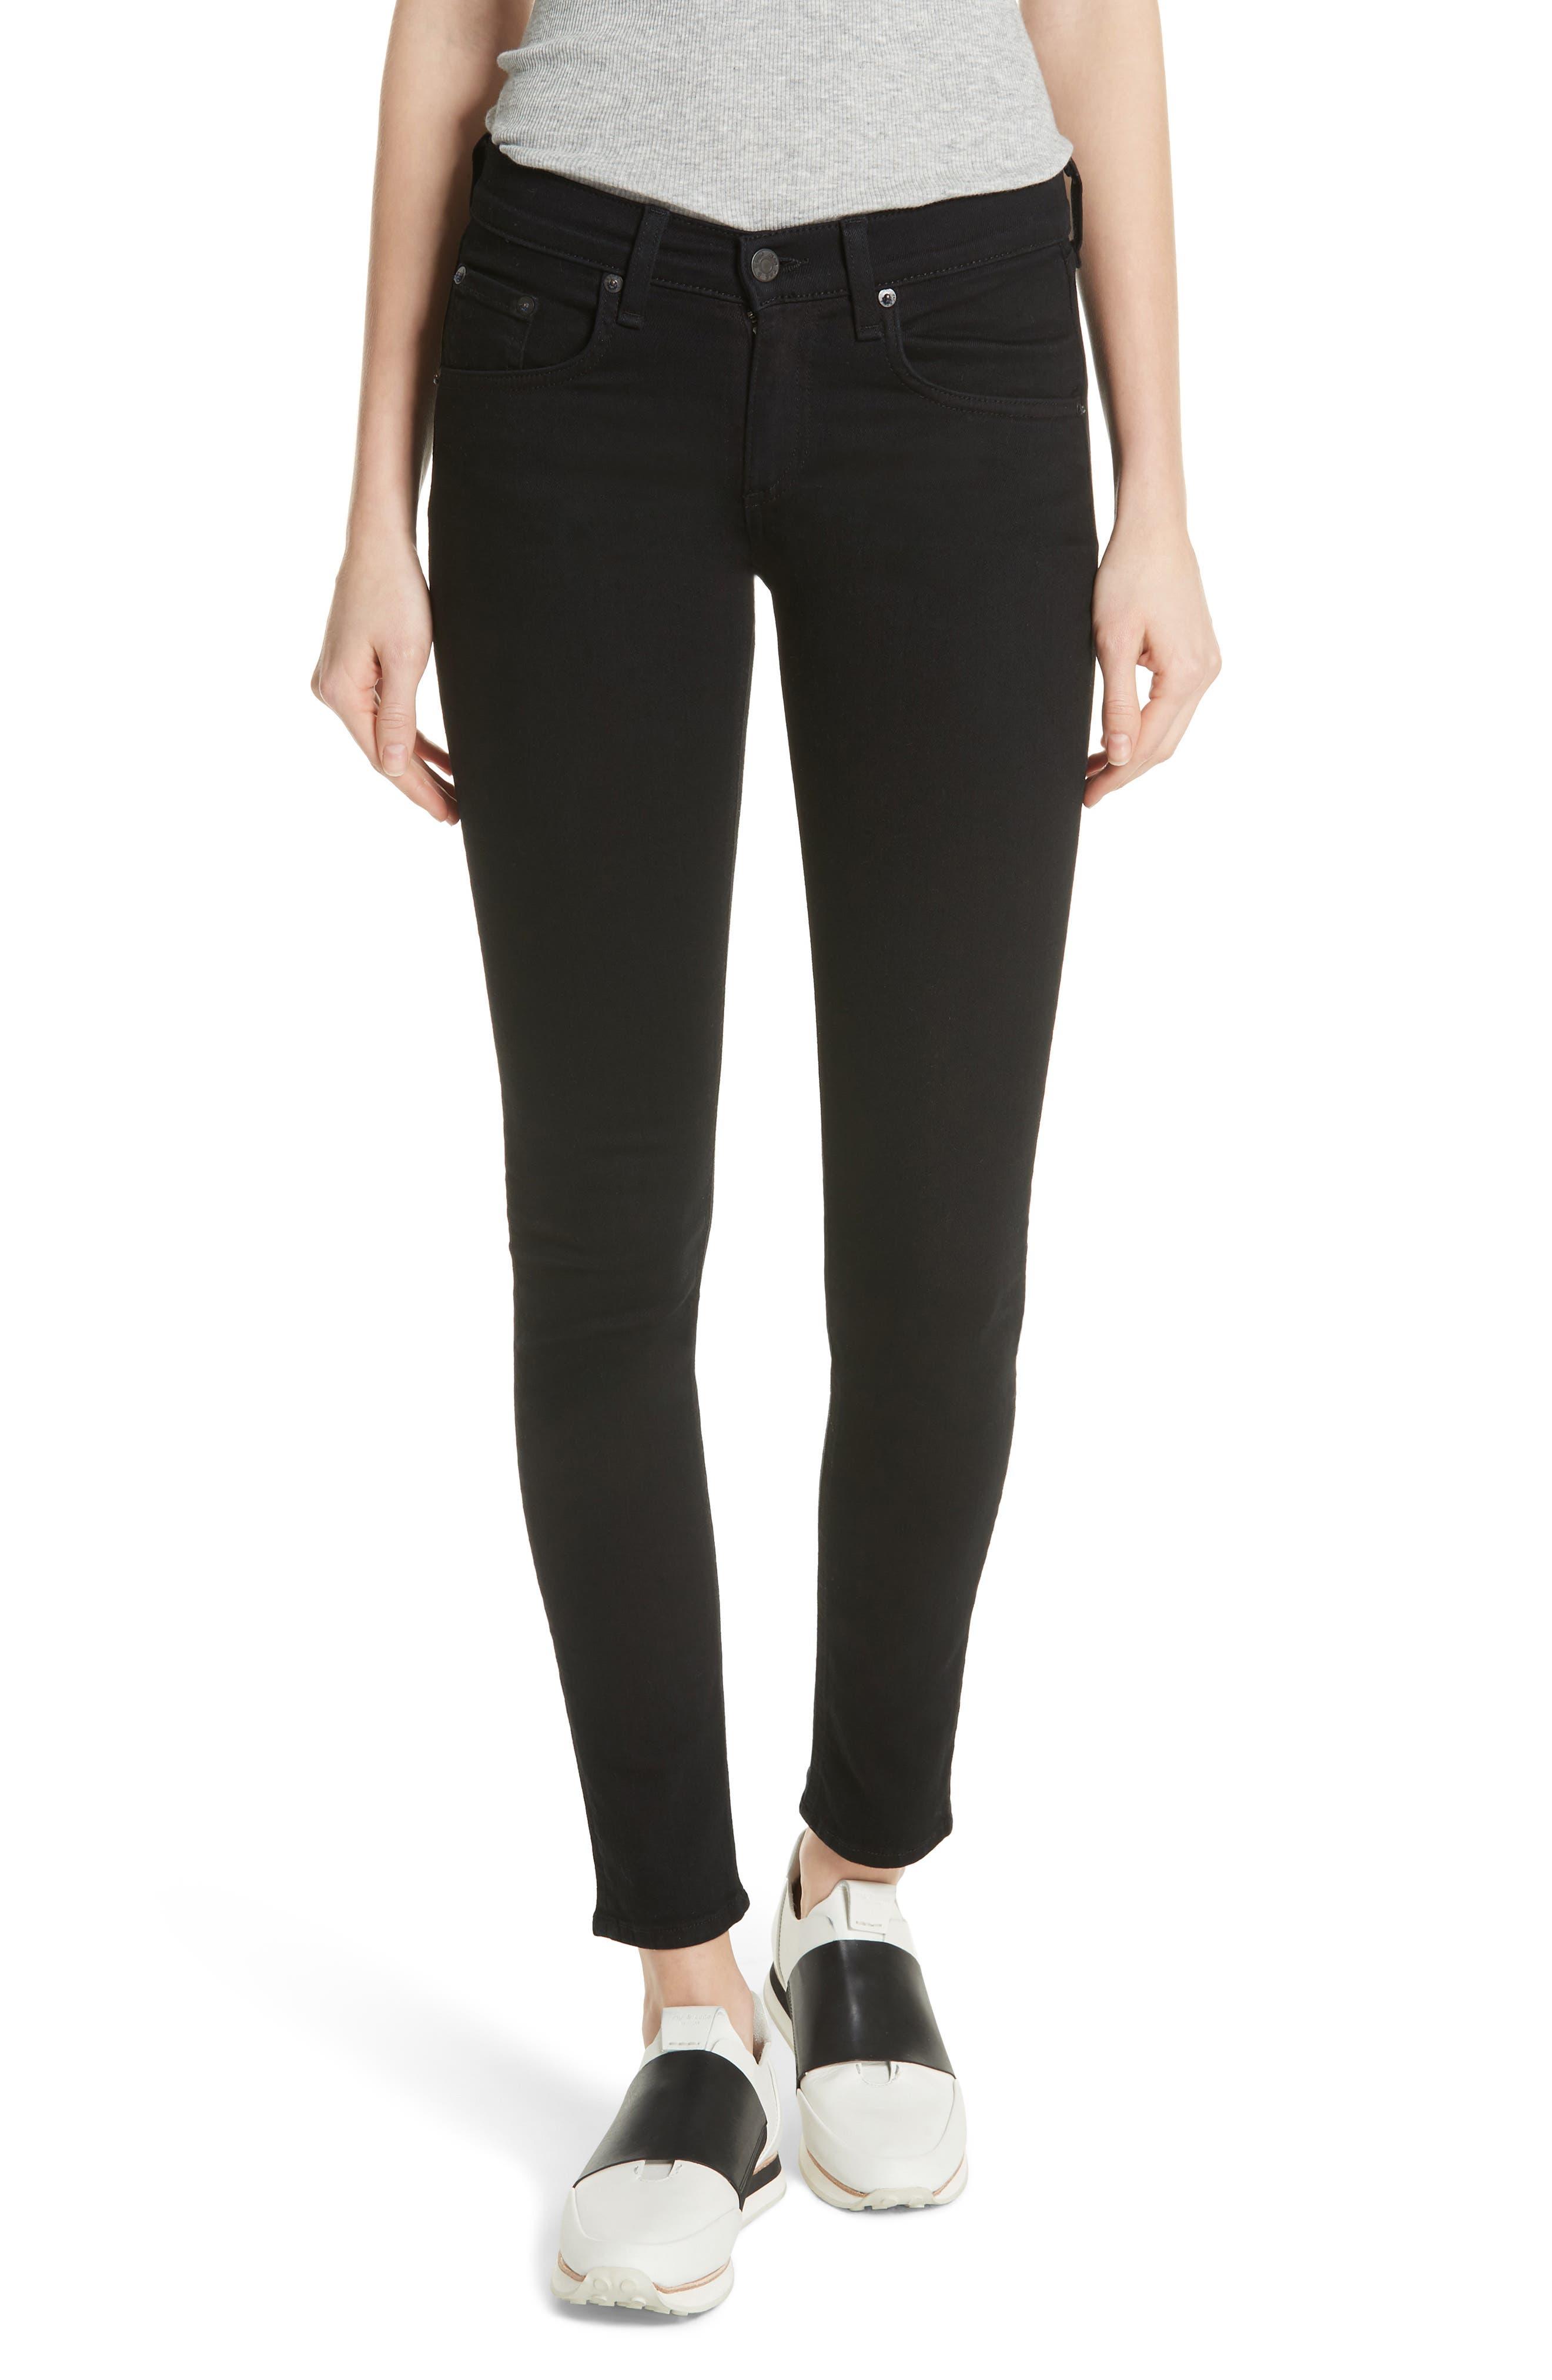 RAG & BONE 'The Skinny' Stretch Jeans, Main, color, COAL